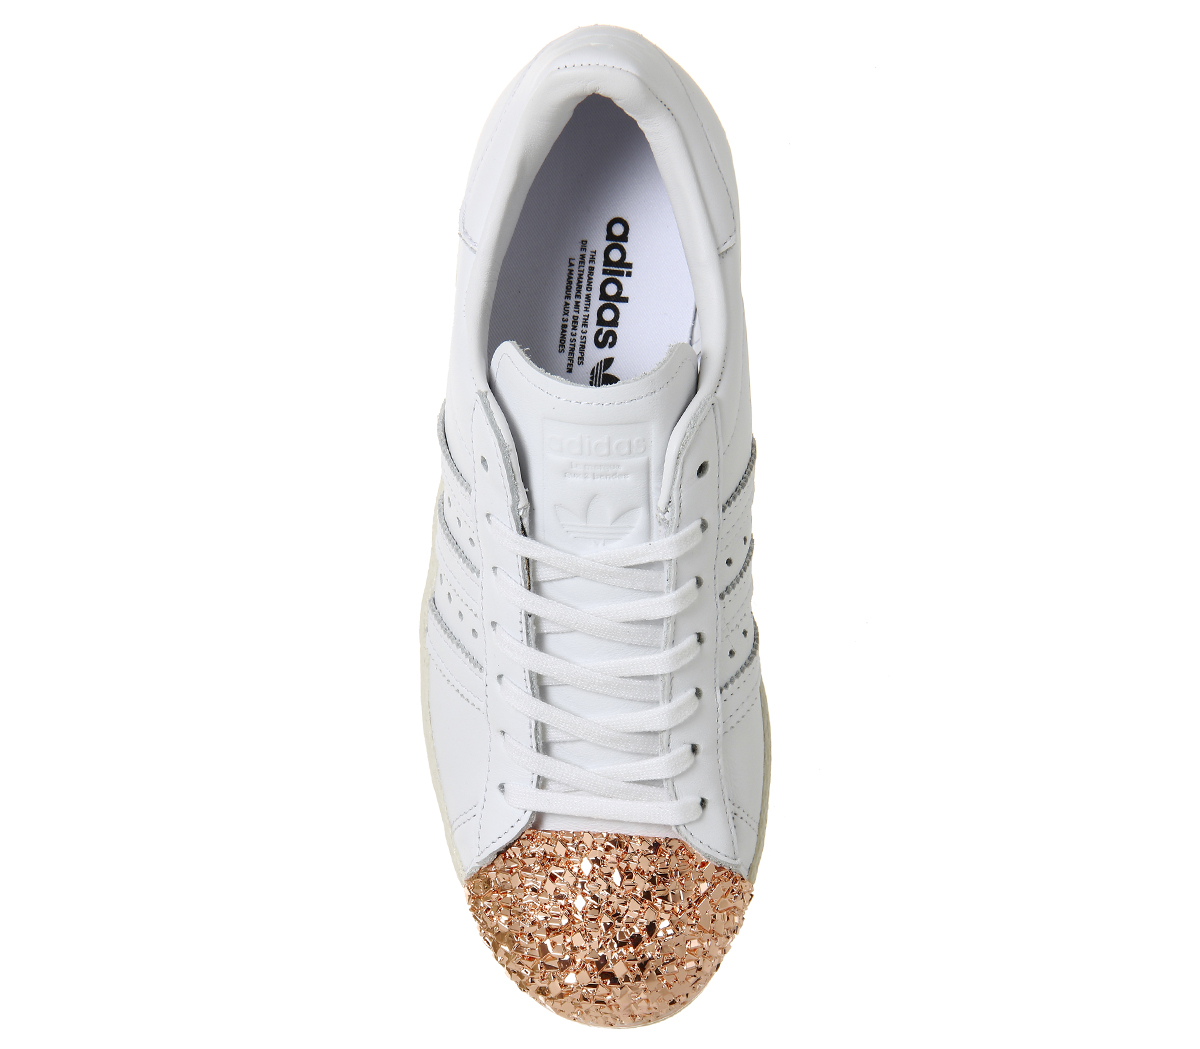 brand new 108e3 972cc adidas superstar 80s gold metal toe